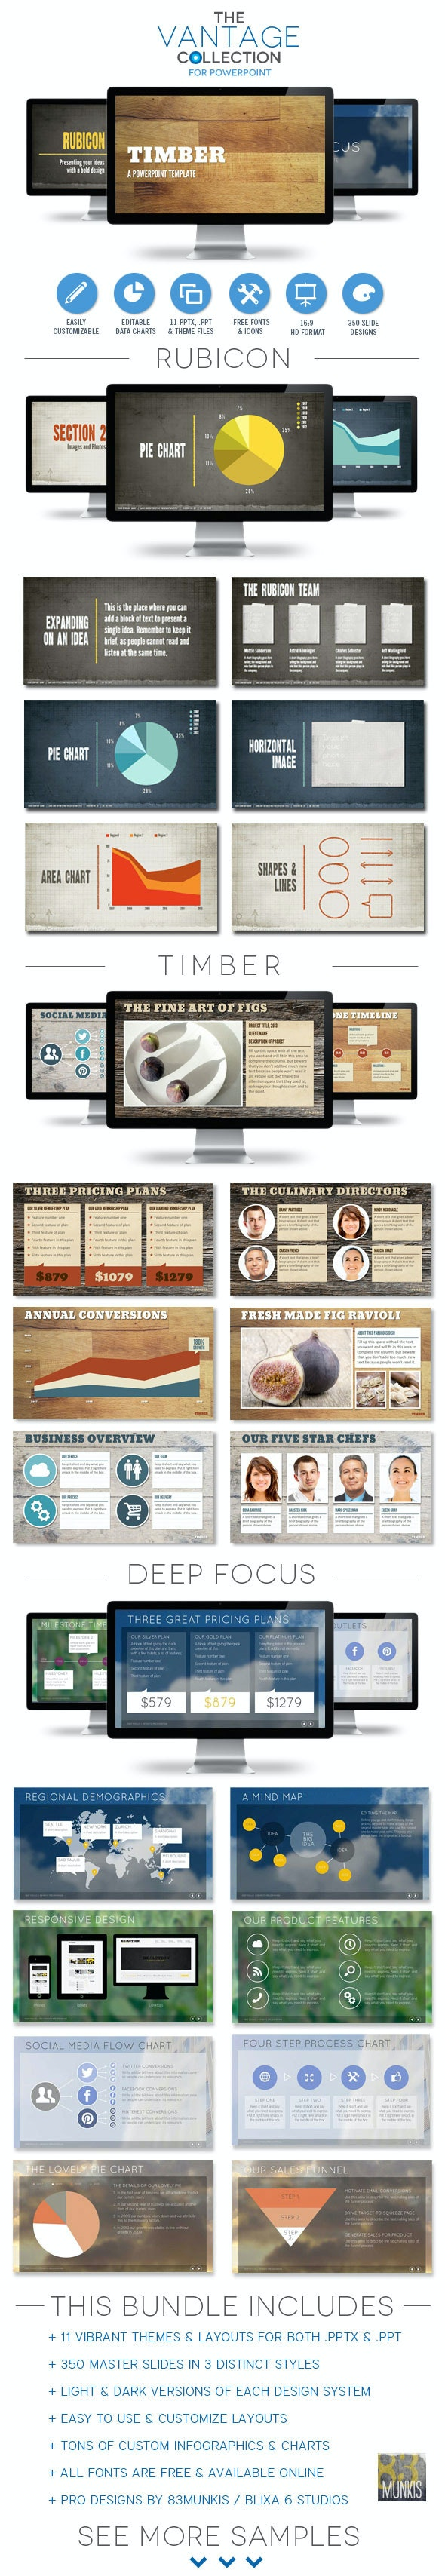 Vantage Collection Powerpoint Template Bundle - Creative PowerPoint Templates